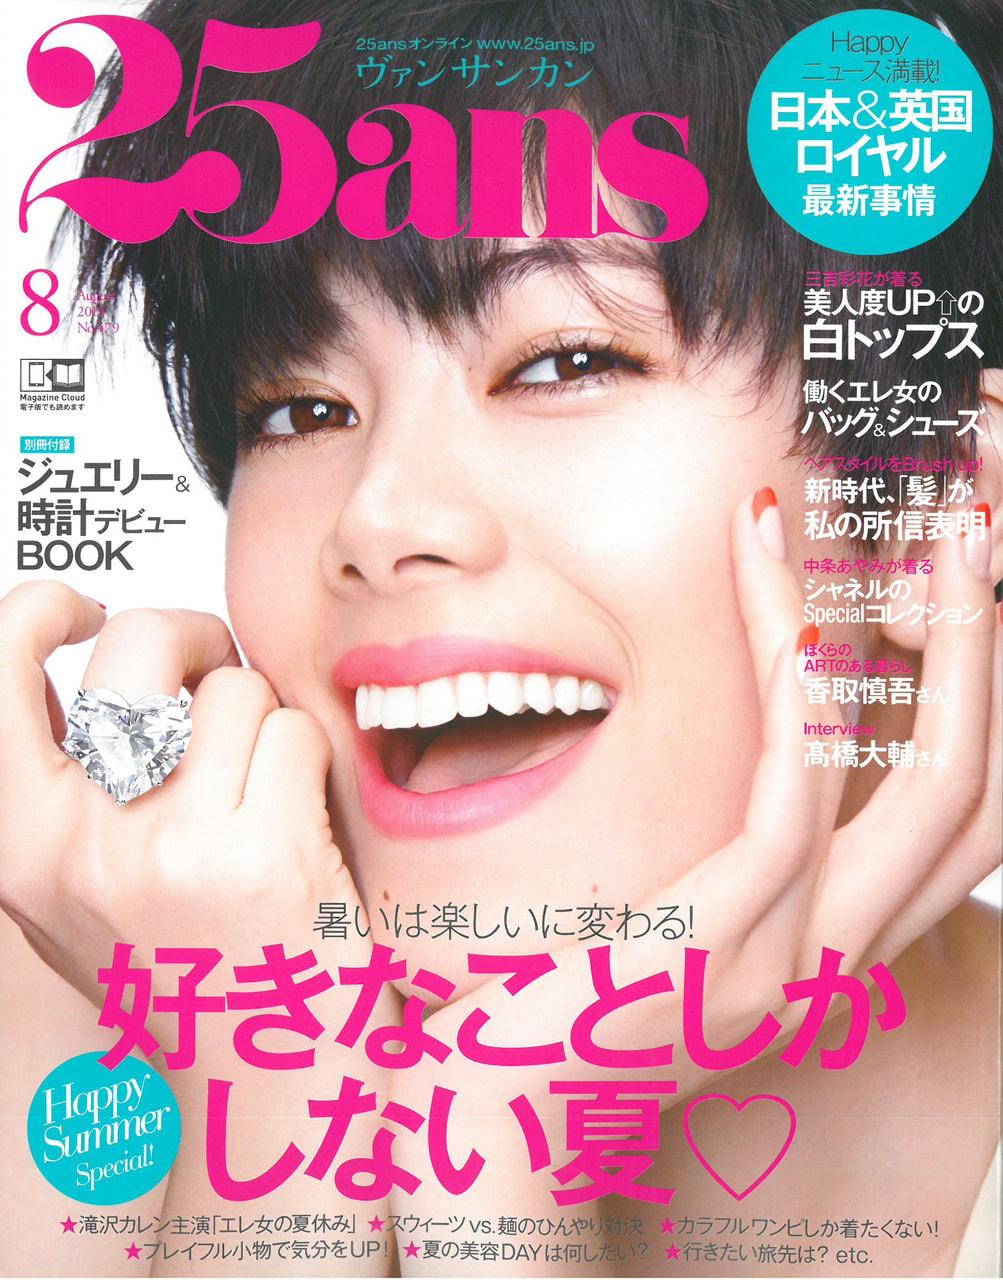 25ans8月号(2019年6月28日発売)